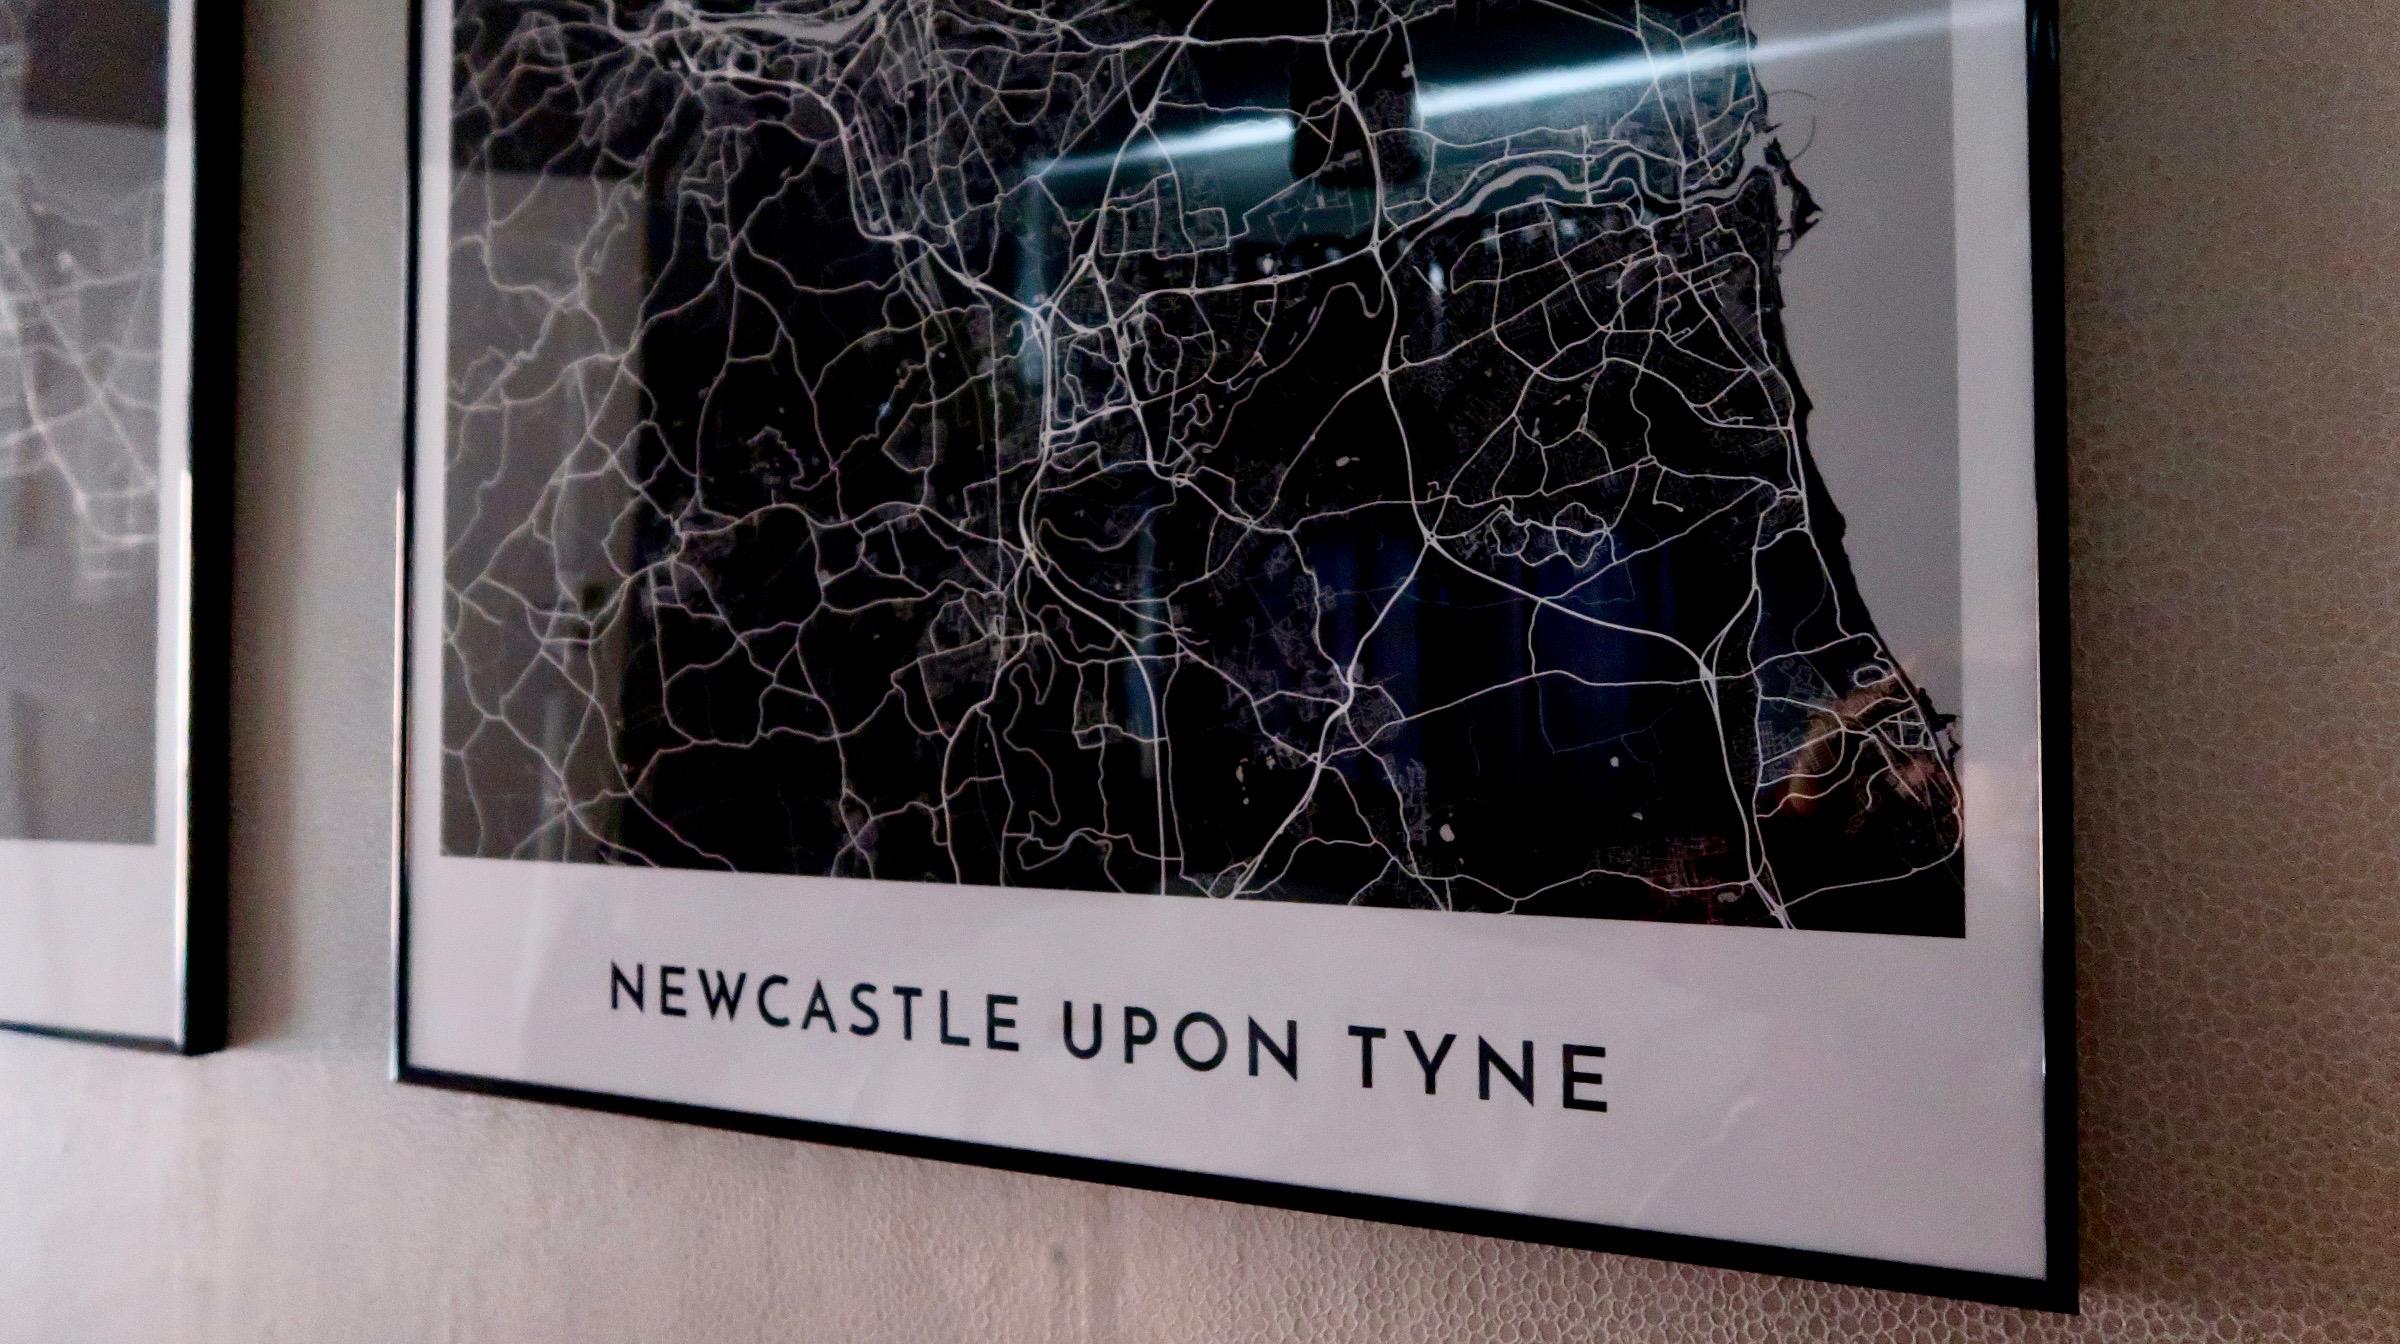 Newcastle upon Tyne | Alvar Carto | Cartography Prints of Global Destinations | Home Interiors & Decor | Elle Blonde Luxury Lifestyle Destination Blog